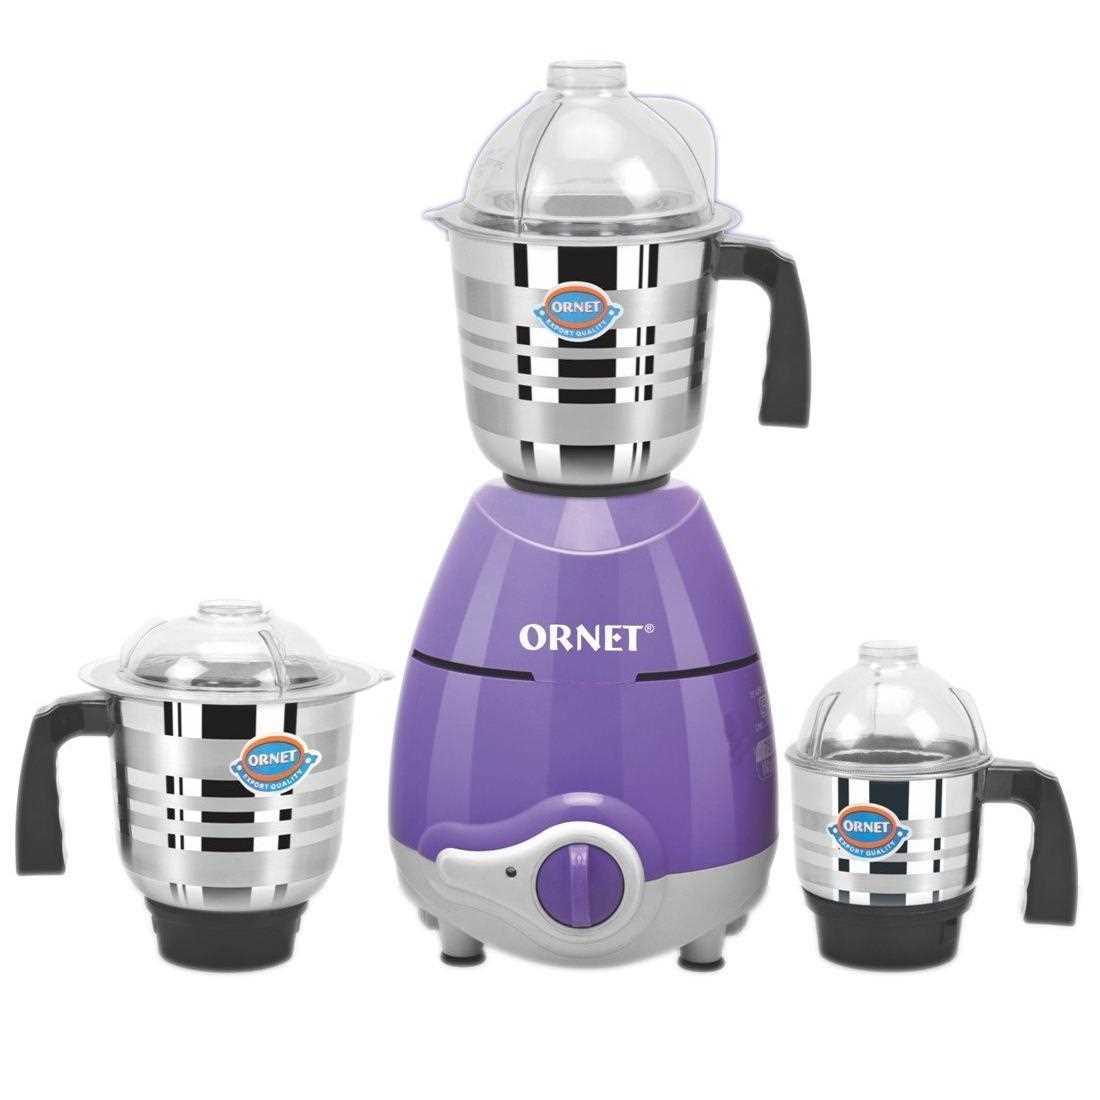 Ornet Namo 550 W Mixer Grinder